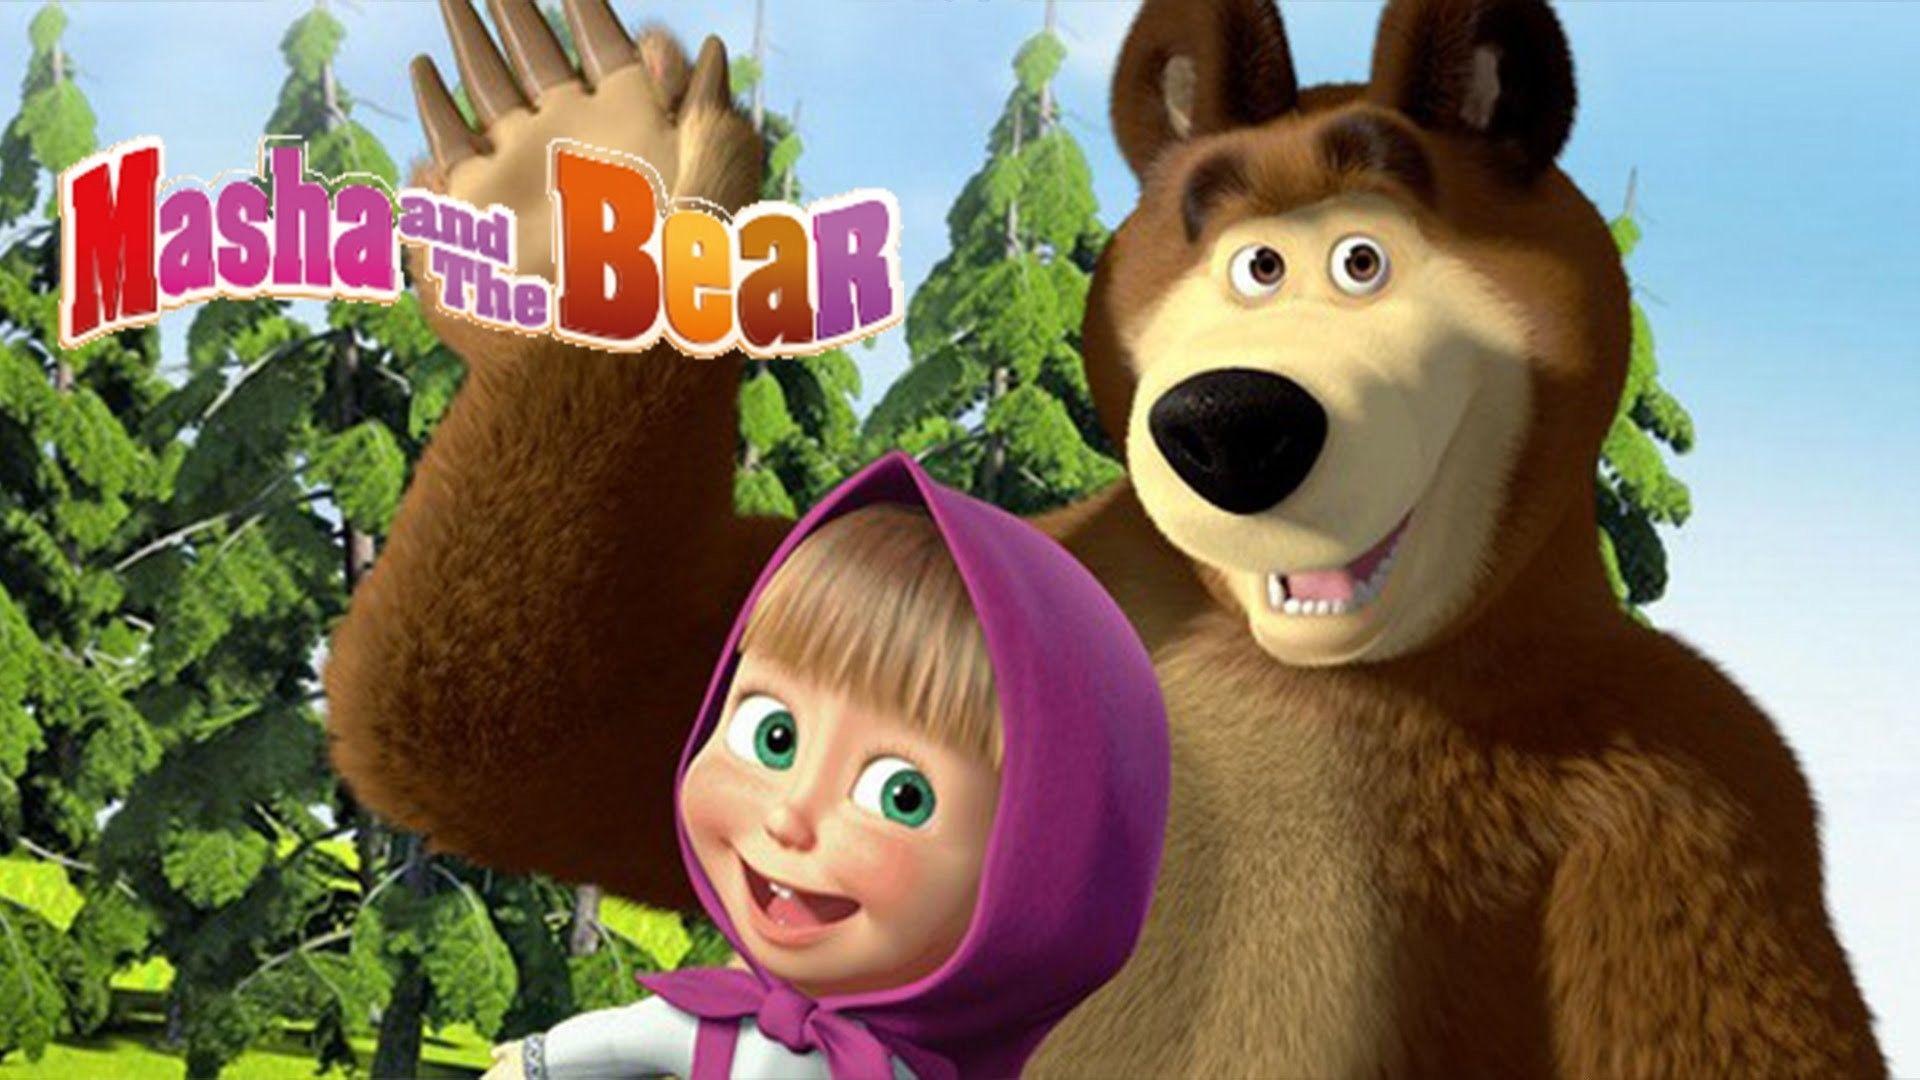 Masha And The Bear Wallpapers Top Free Masha And The Bear